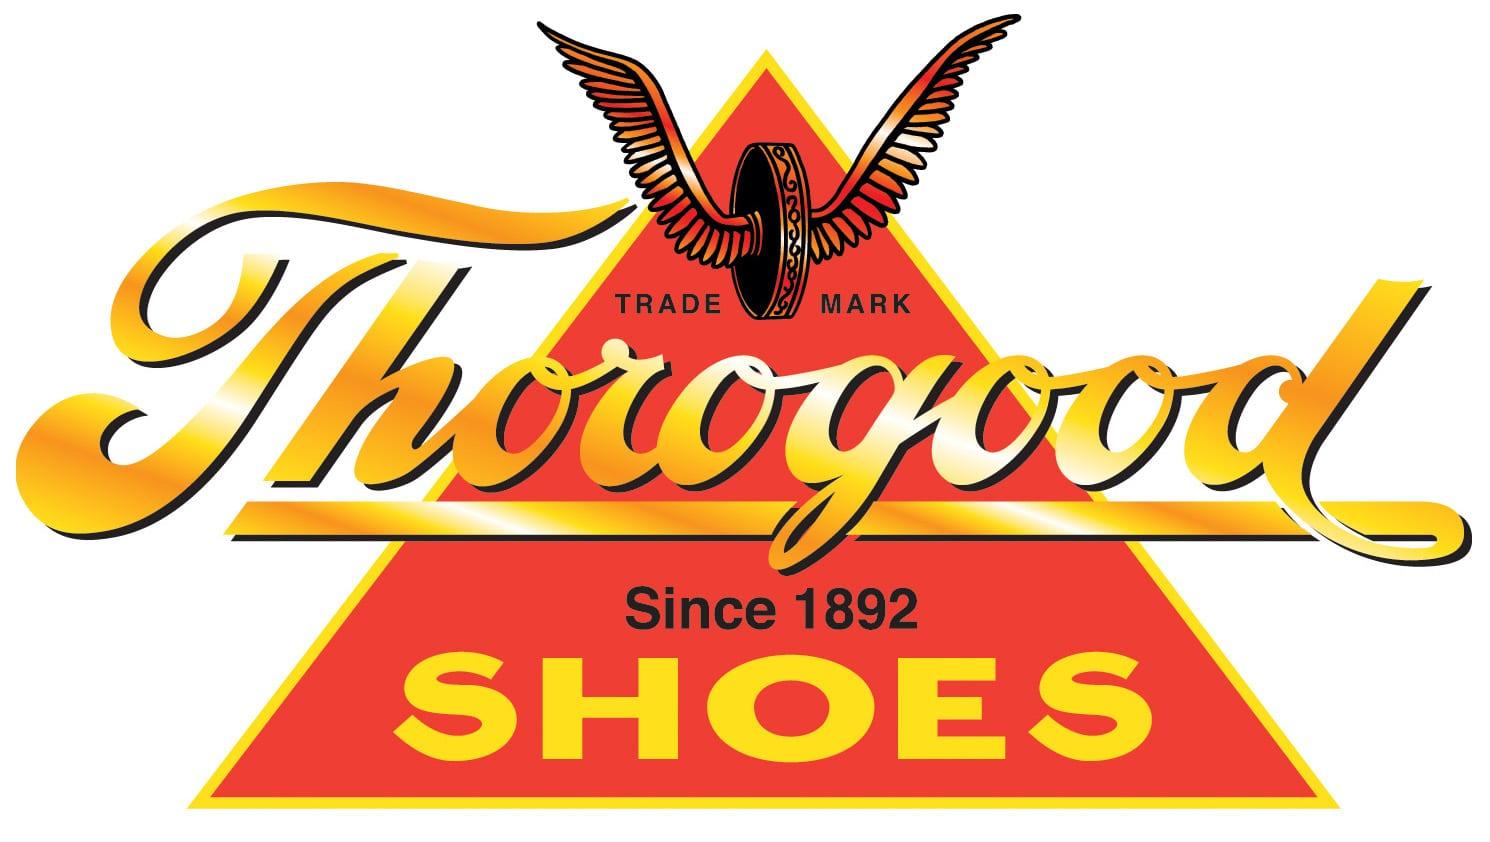 thorogood-boots-logo